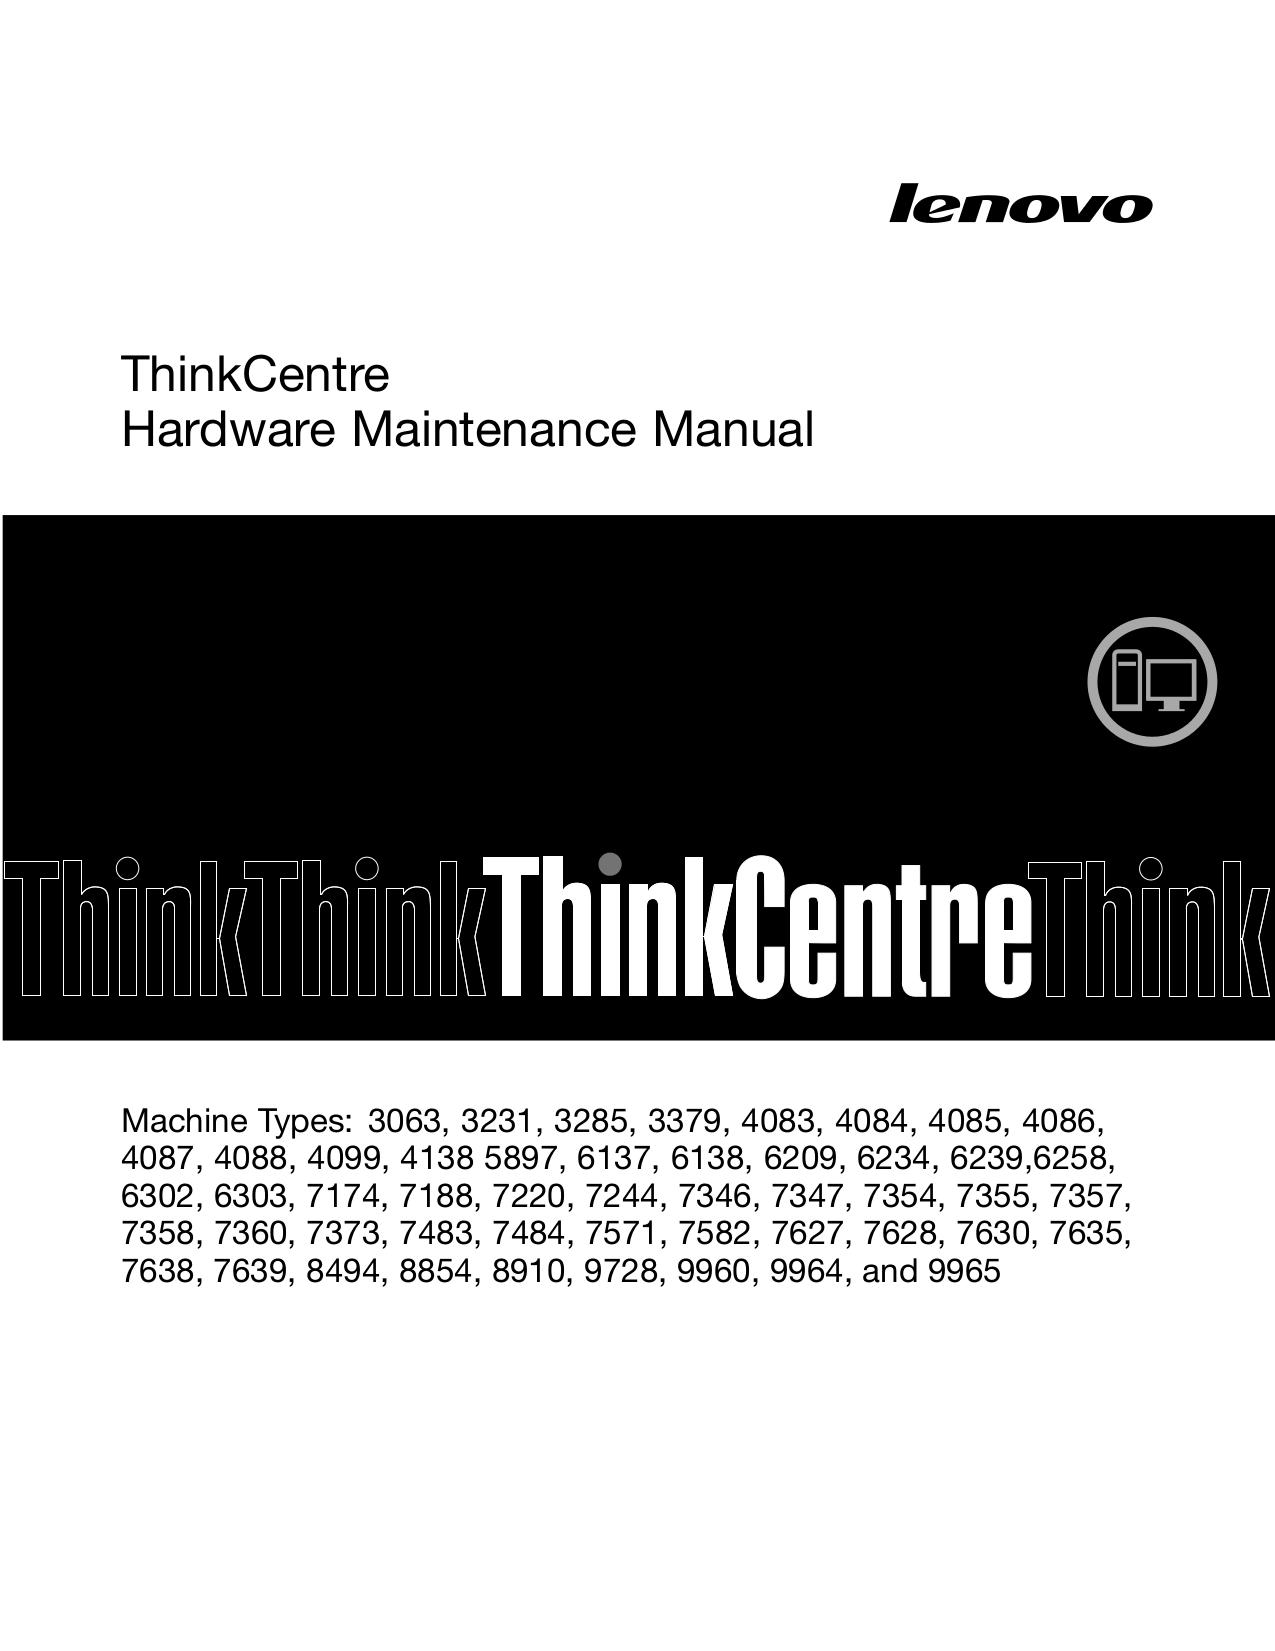 pdf for Lenovo Desktop ThinkCentre M58p 3063 manual